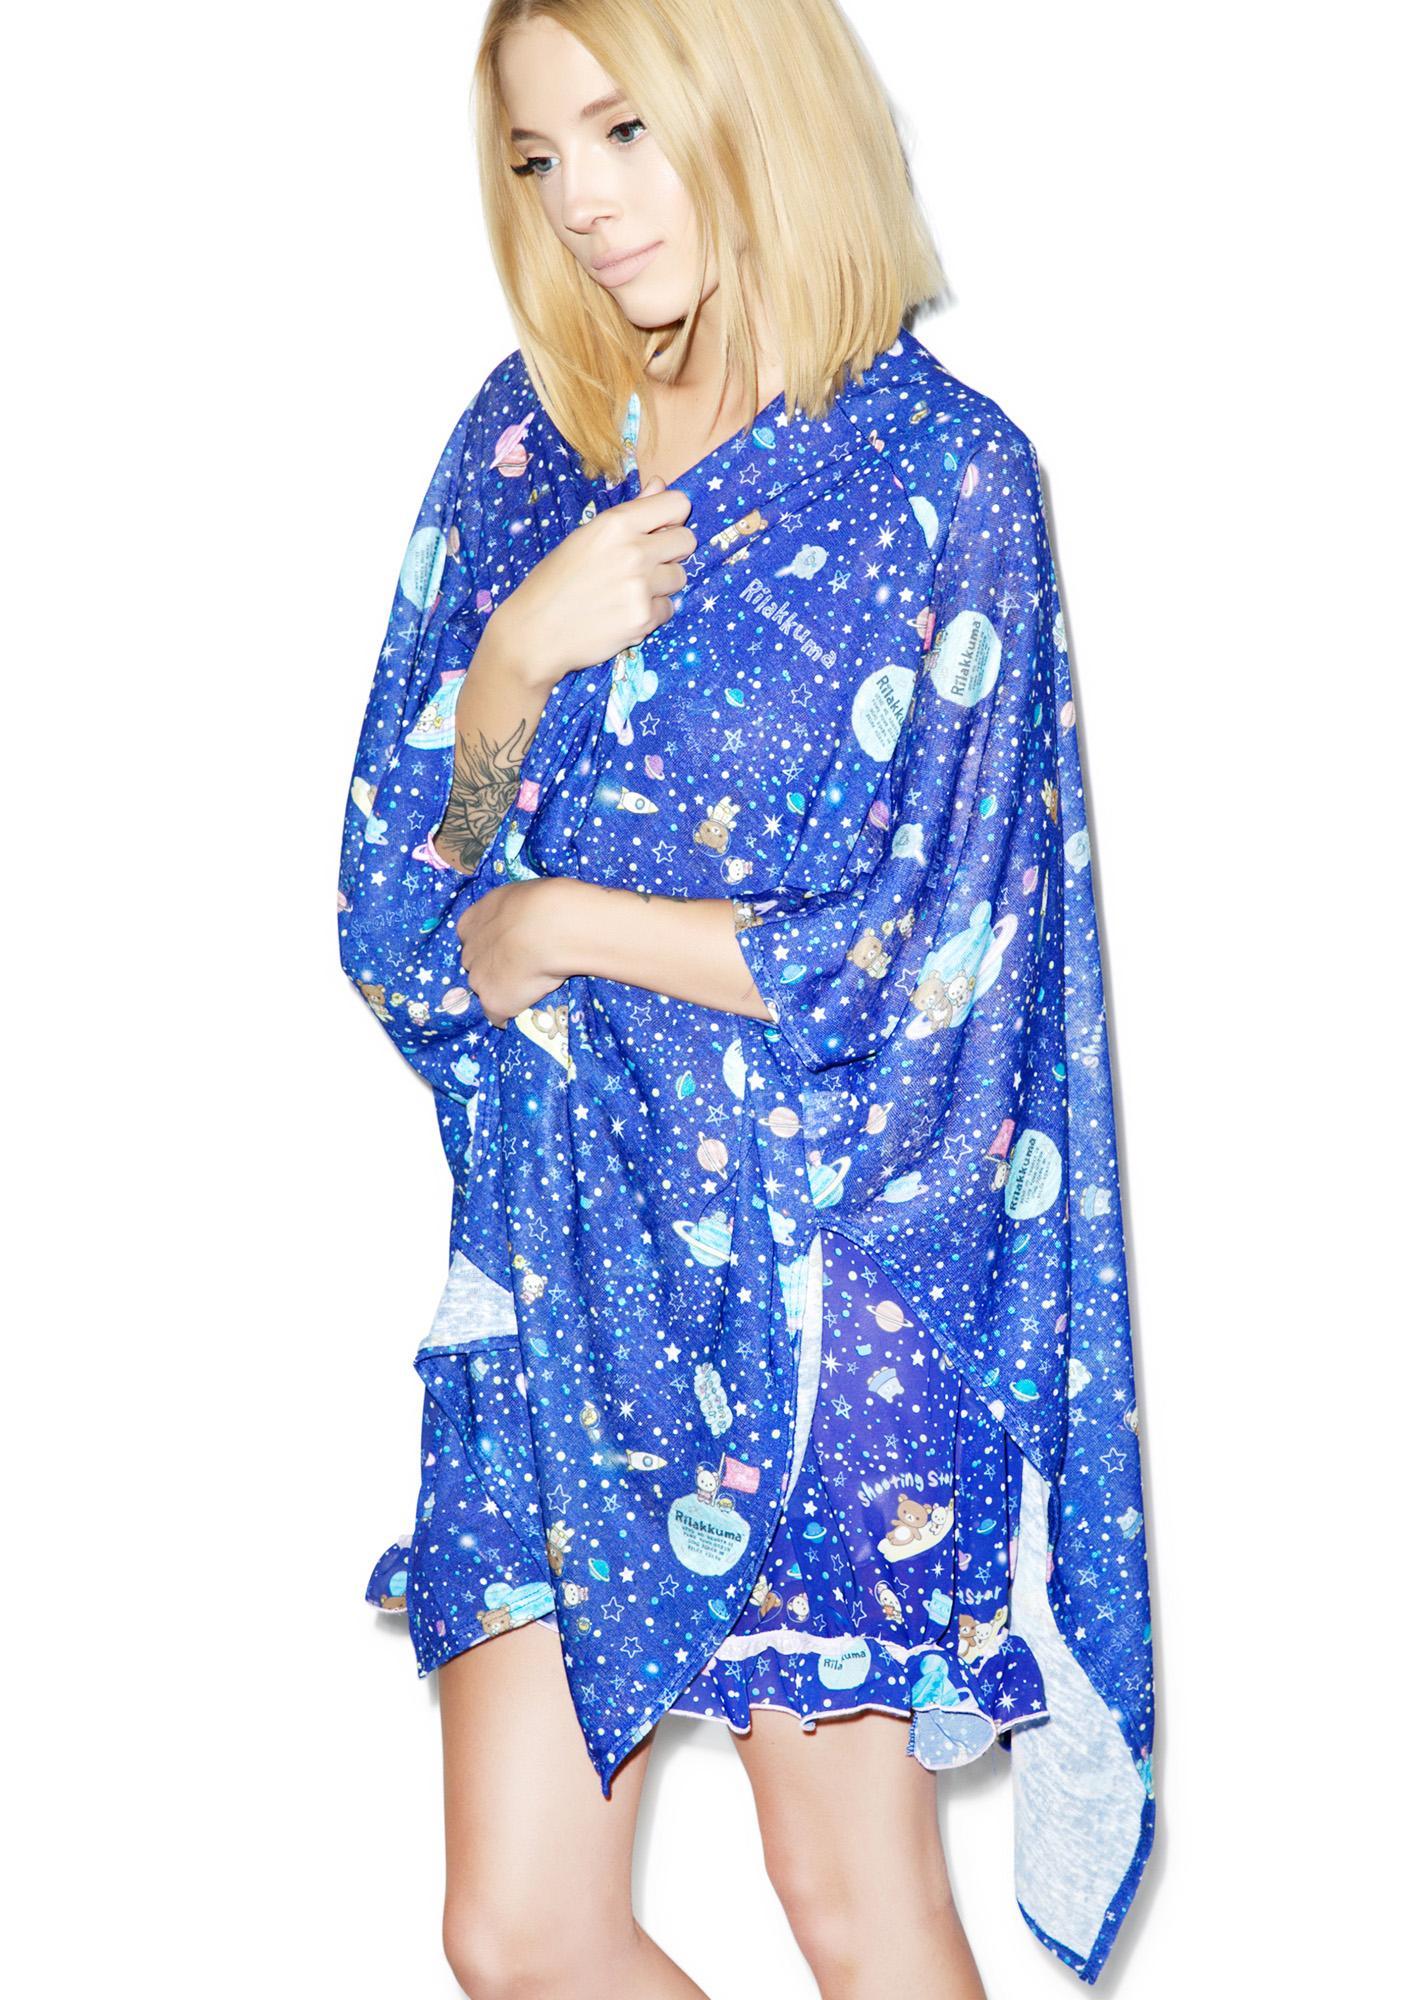 Japan L.A. Rilakkuma In Spaaace! Kimono